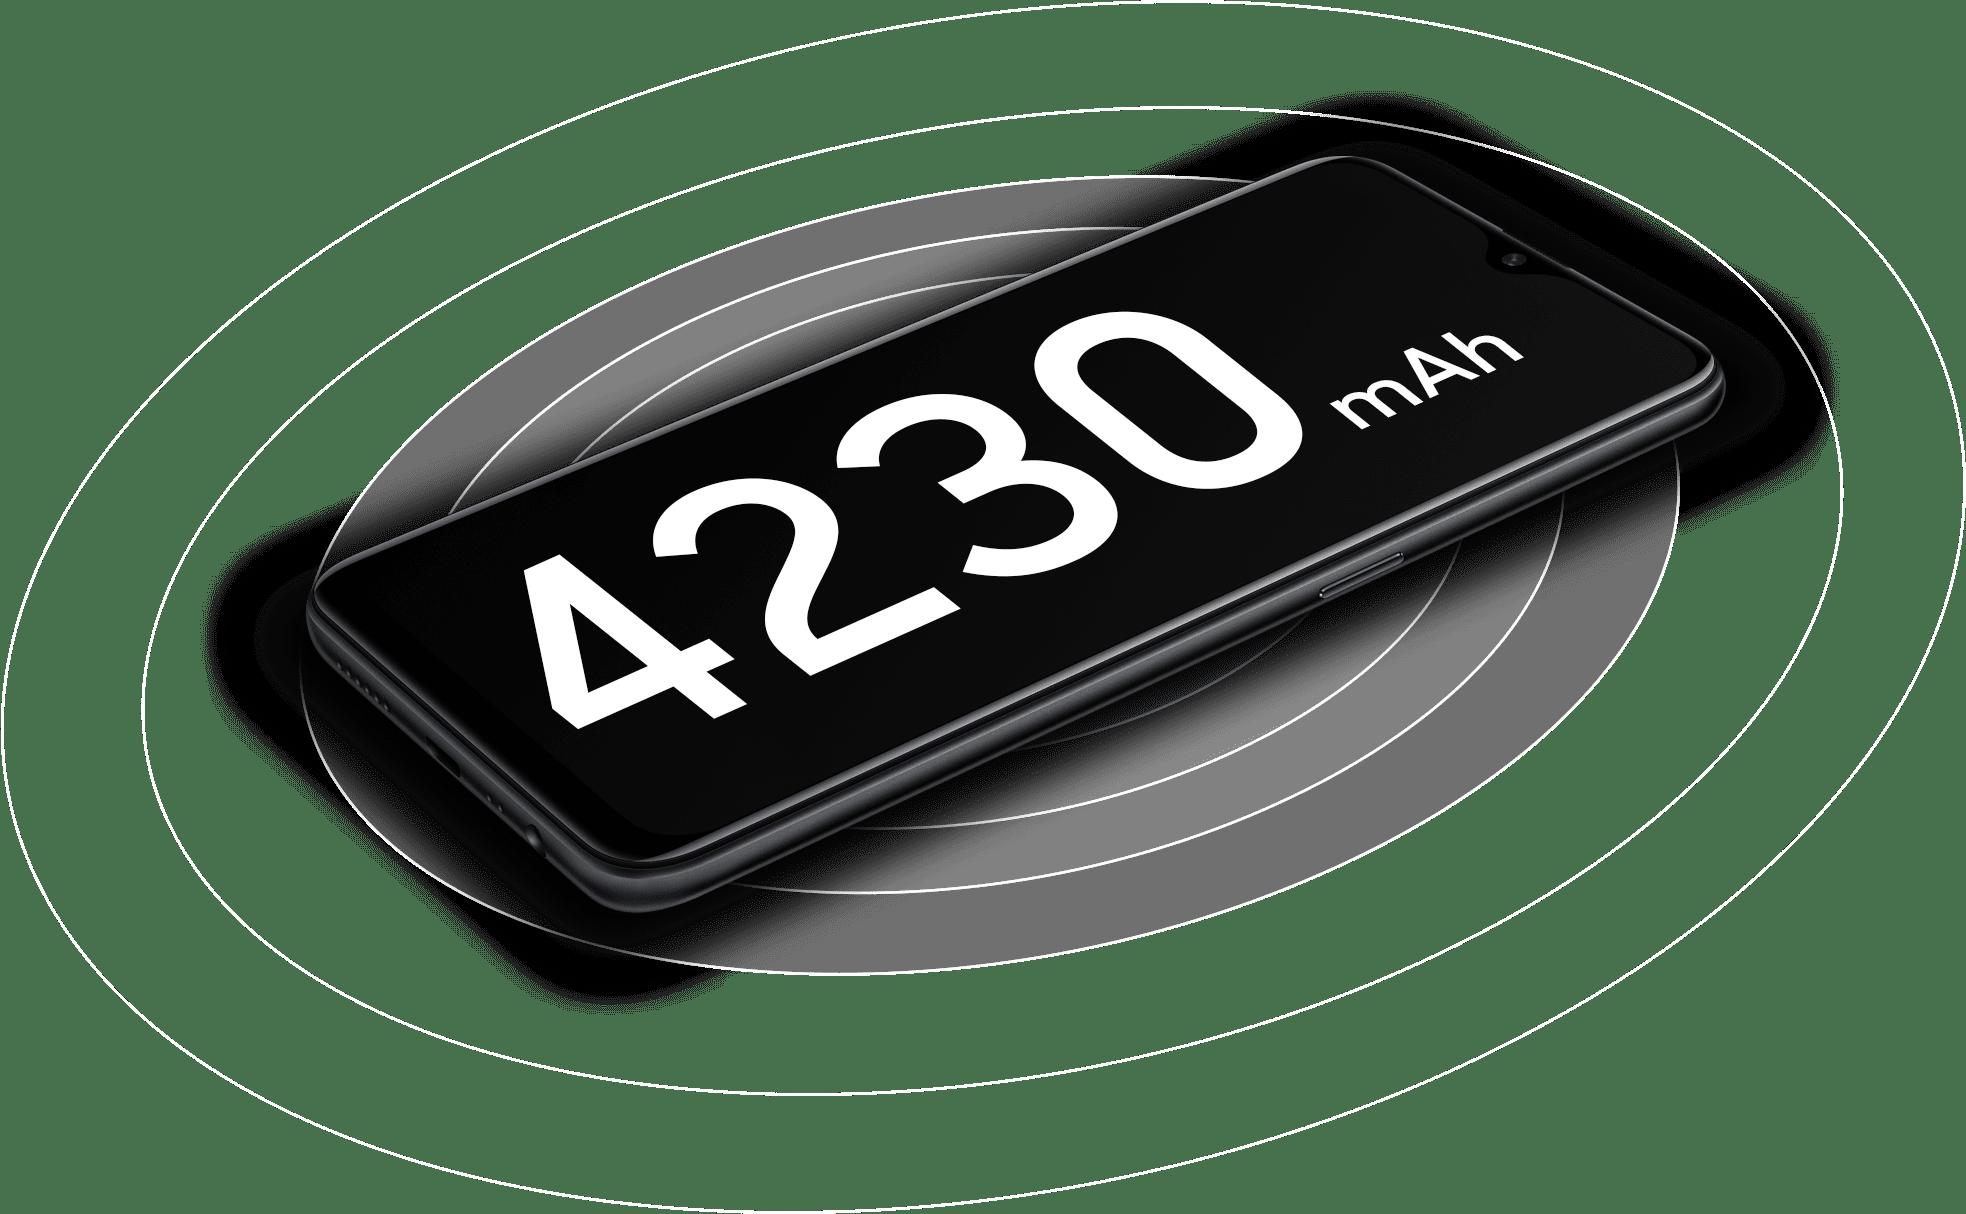 OPPO A5s - 4230mAh battery